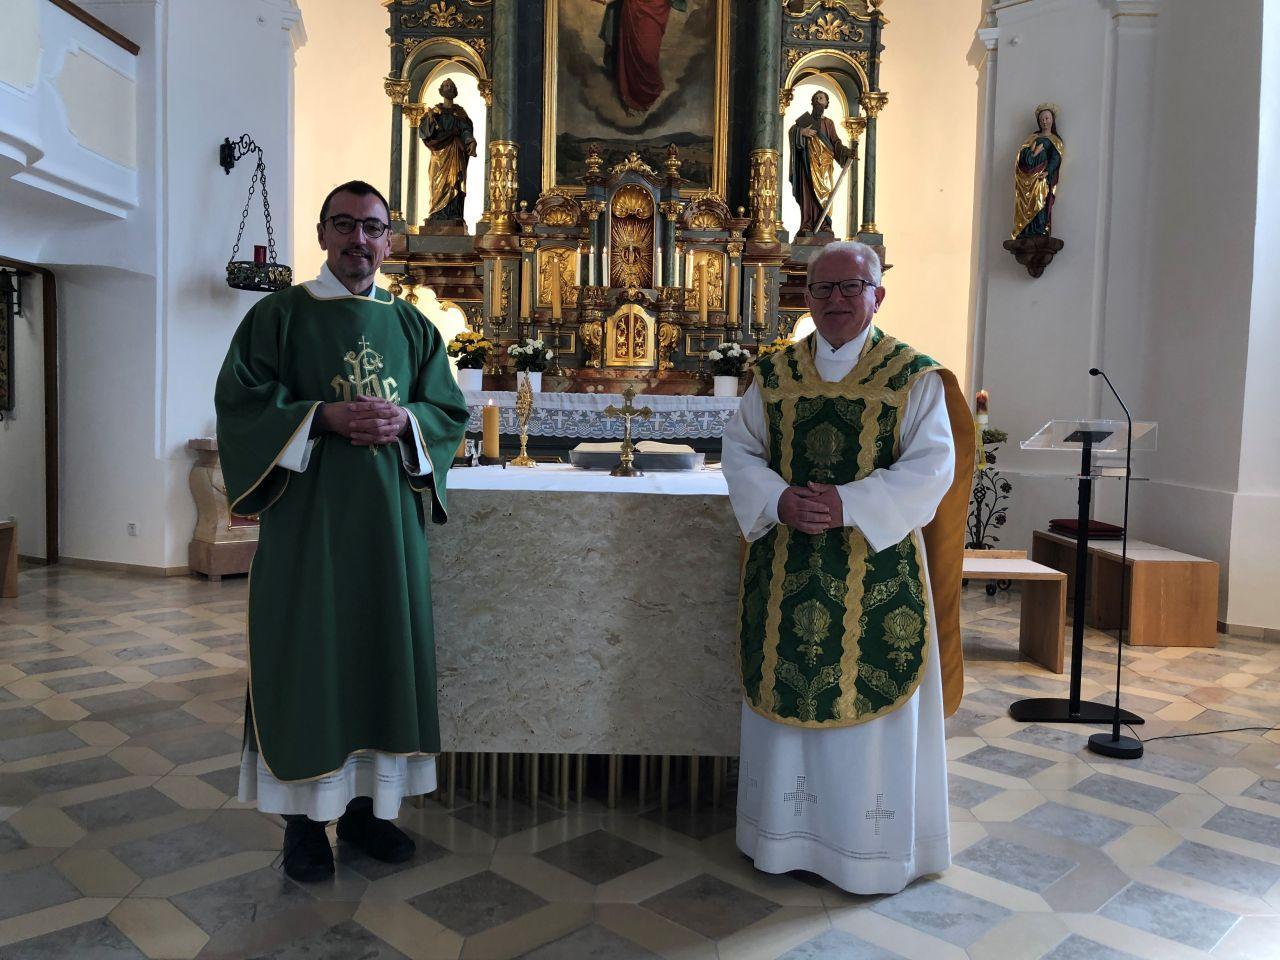 Begrüßung Peintinger Blaibach